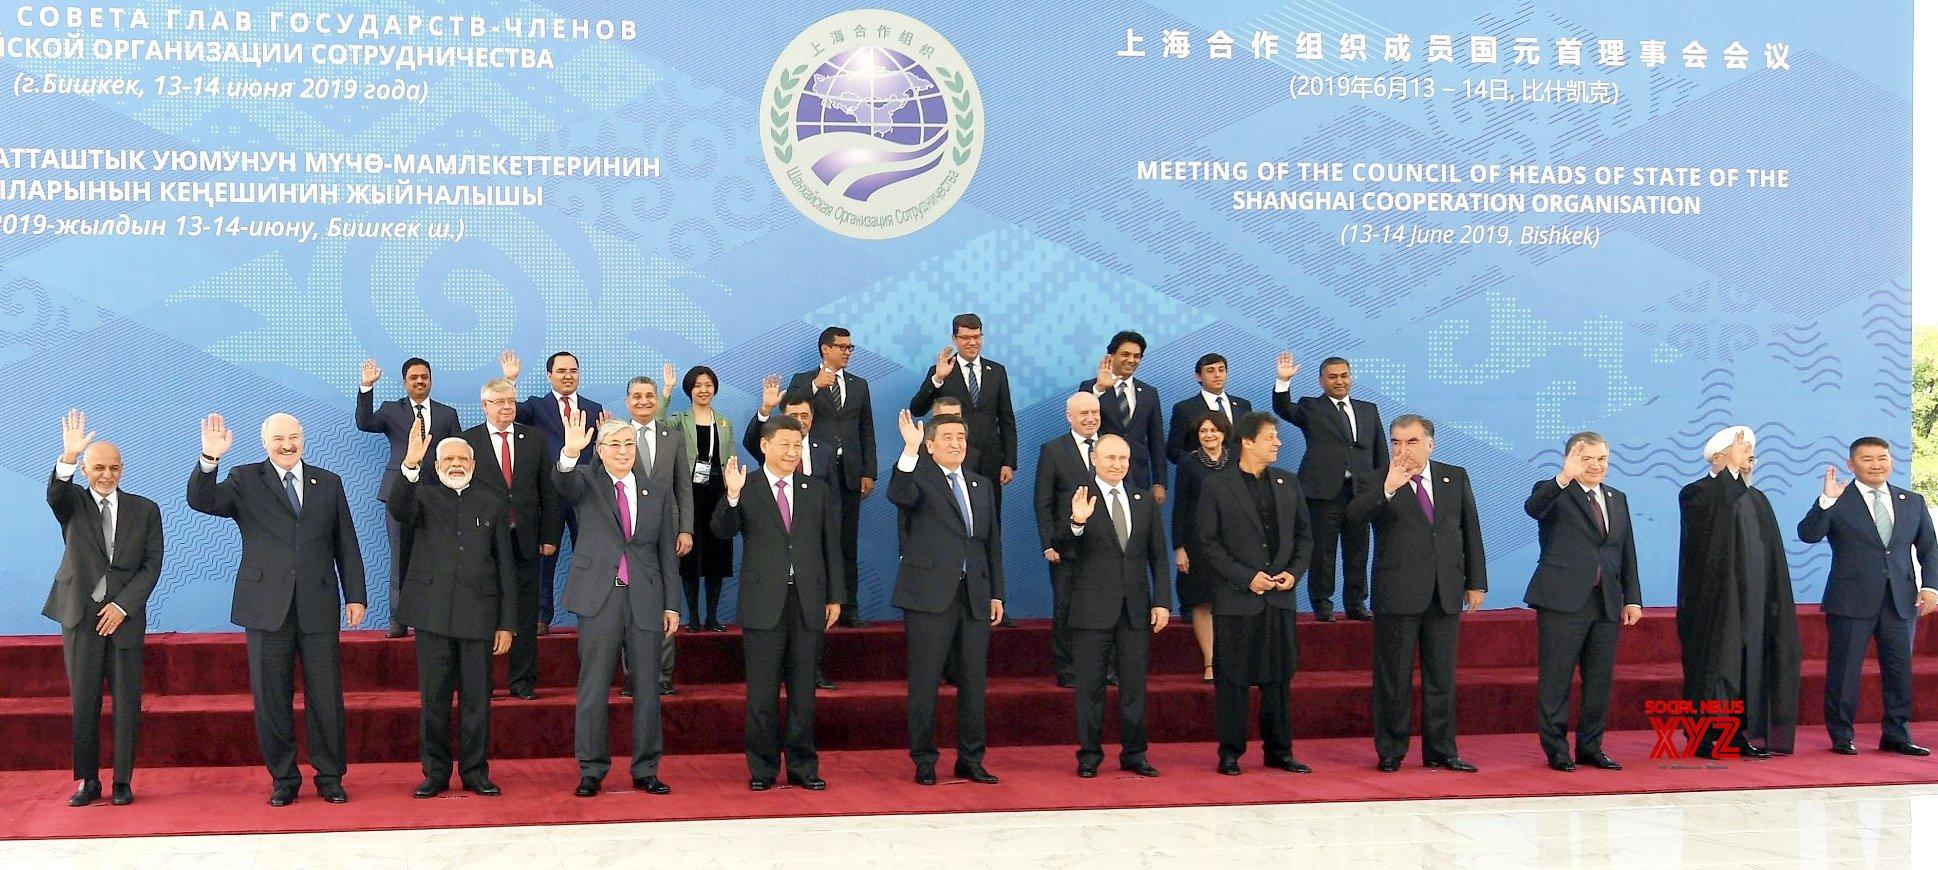 Bishkek: PM Modi with SCO leaders at 2019 Shanghai Cooperation Organization Summit (Batch - 2) #Gallery